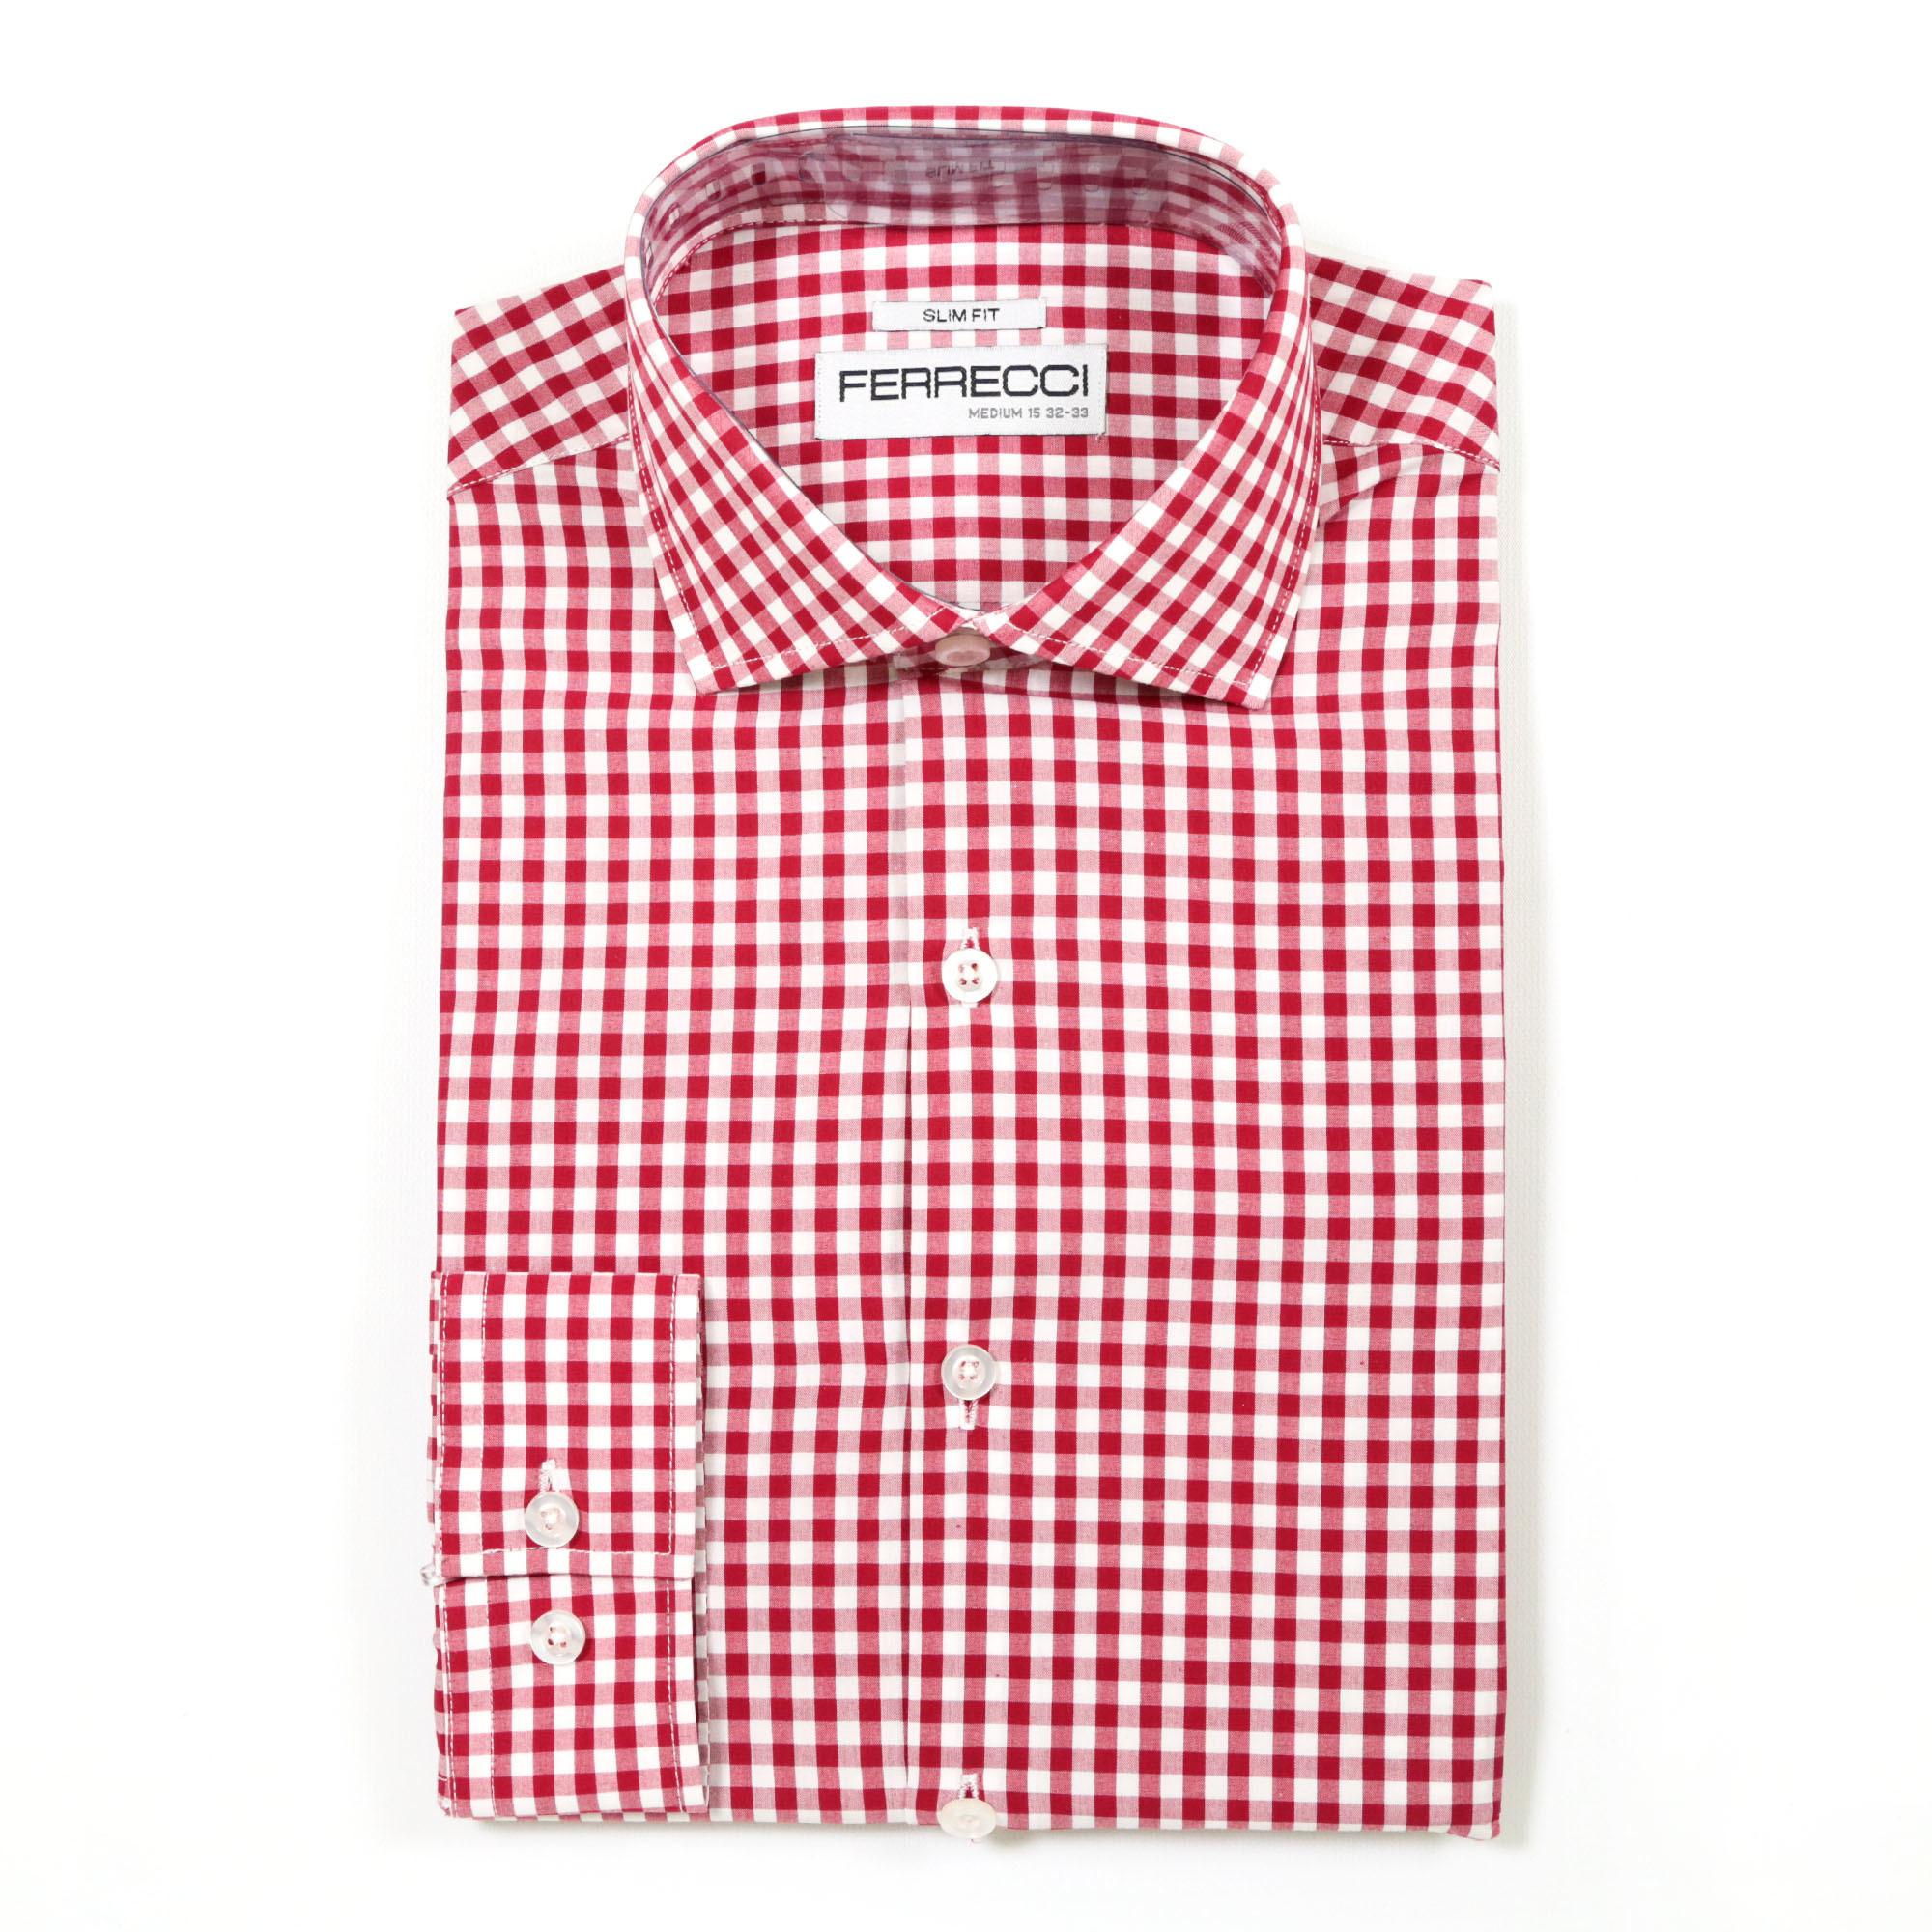 Shop Ferrecci Mens Slim Fit Cotton Gingham Check Dress Shirts Free